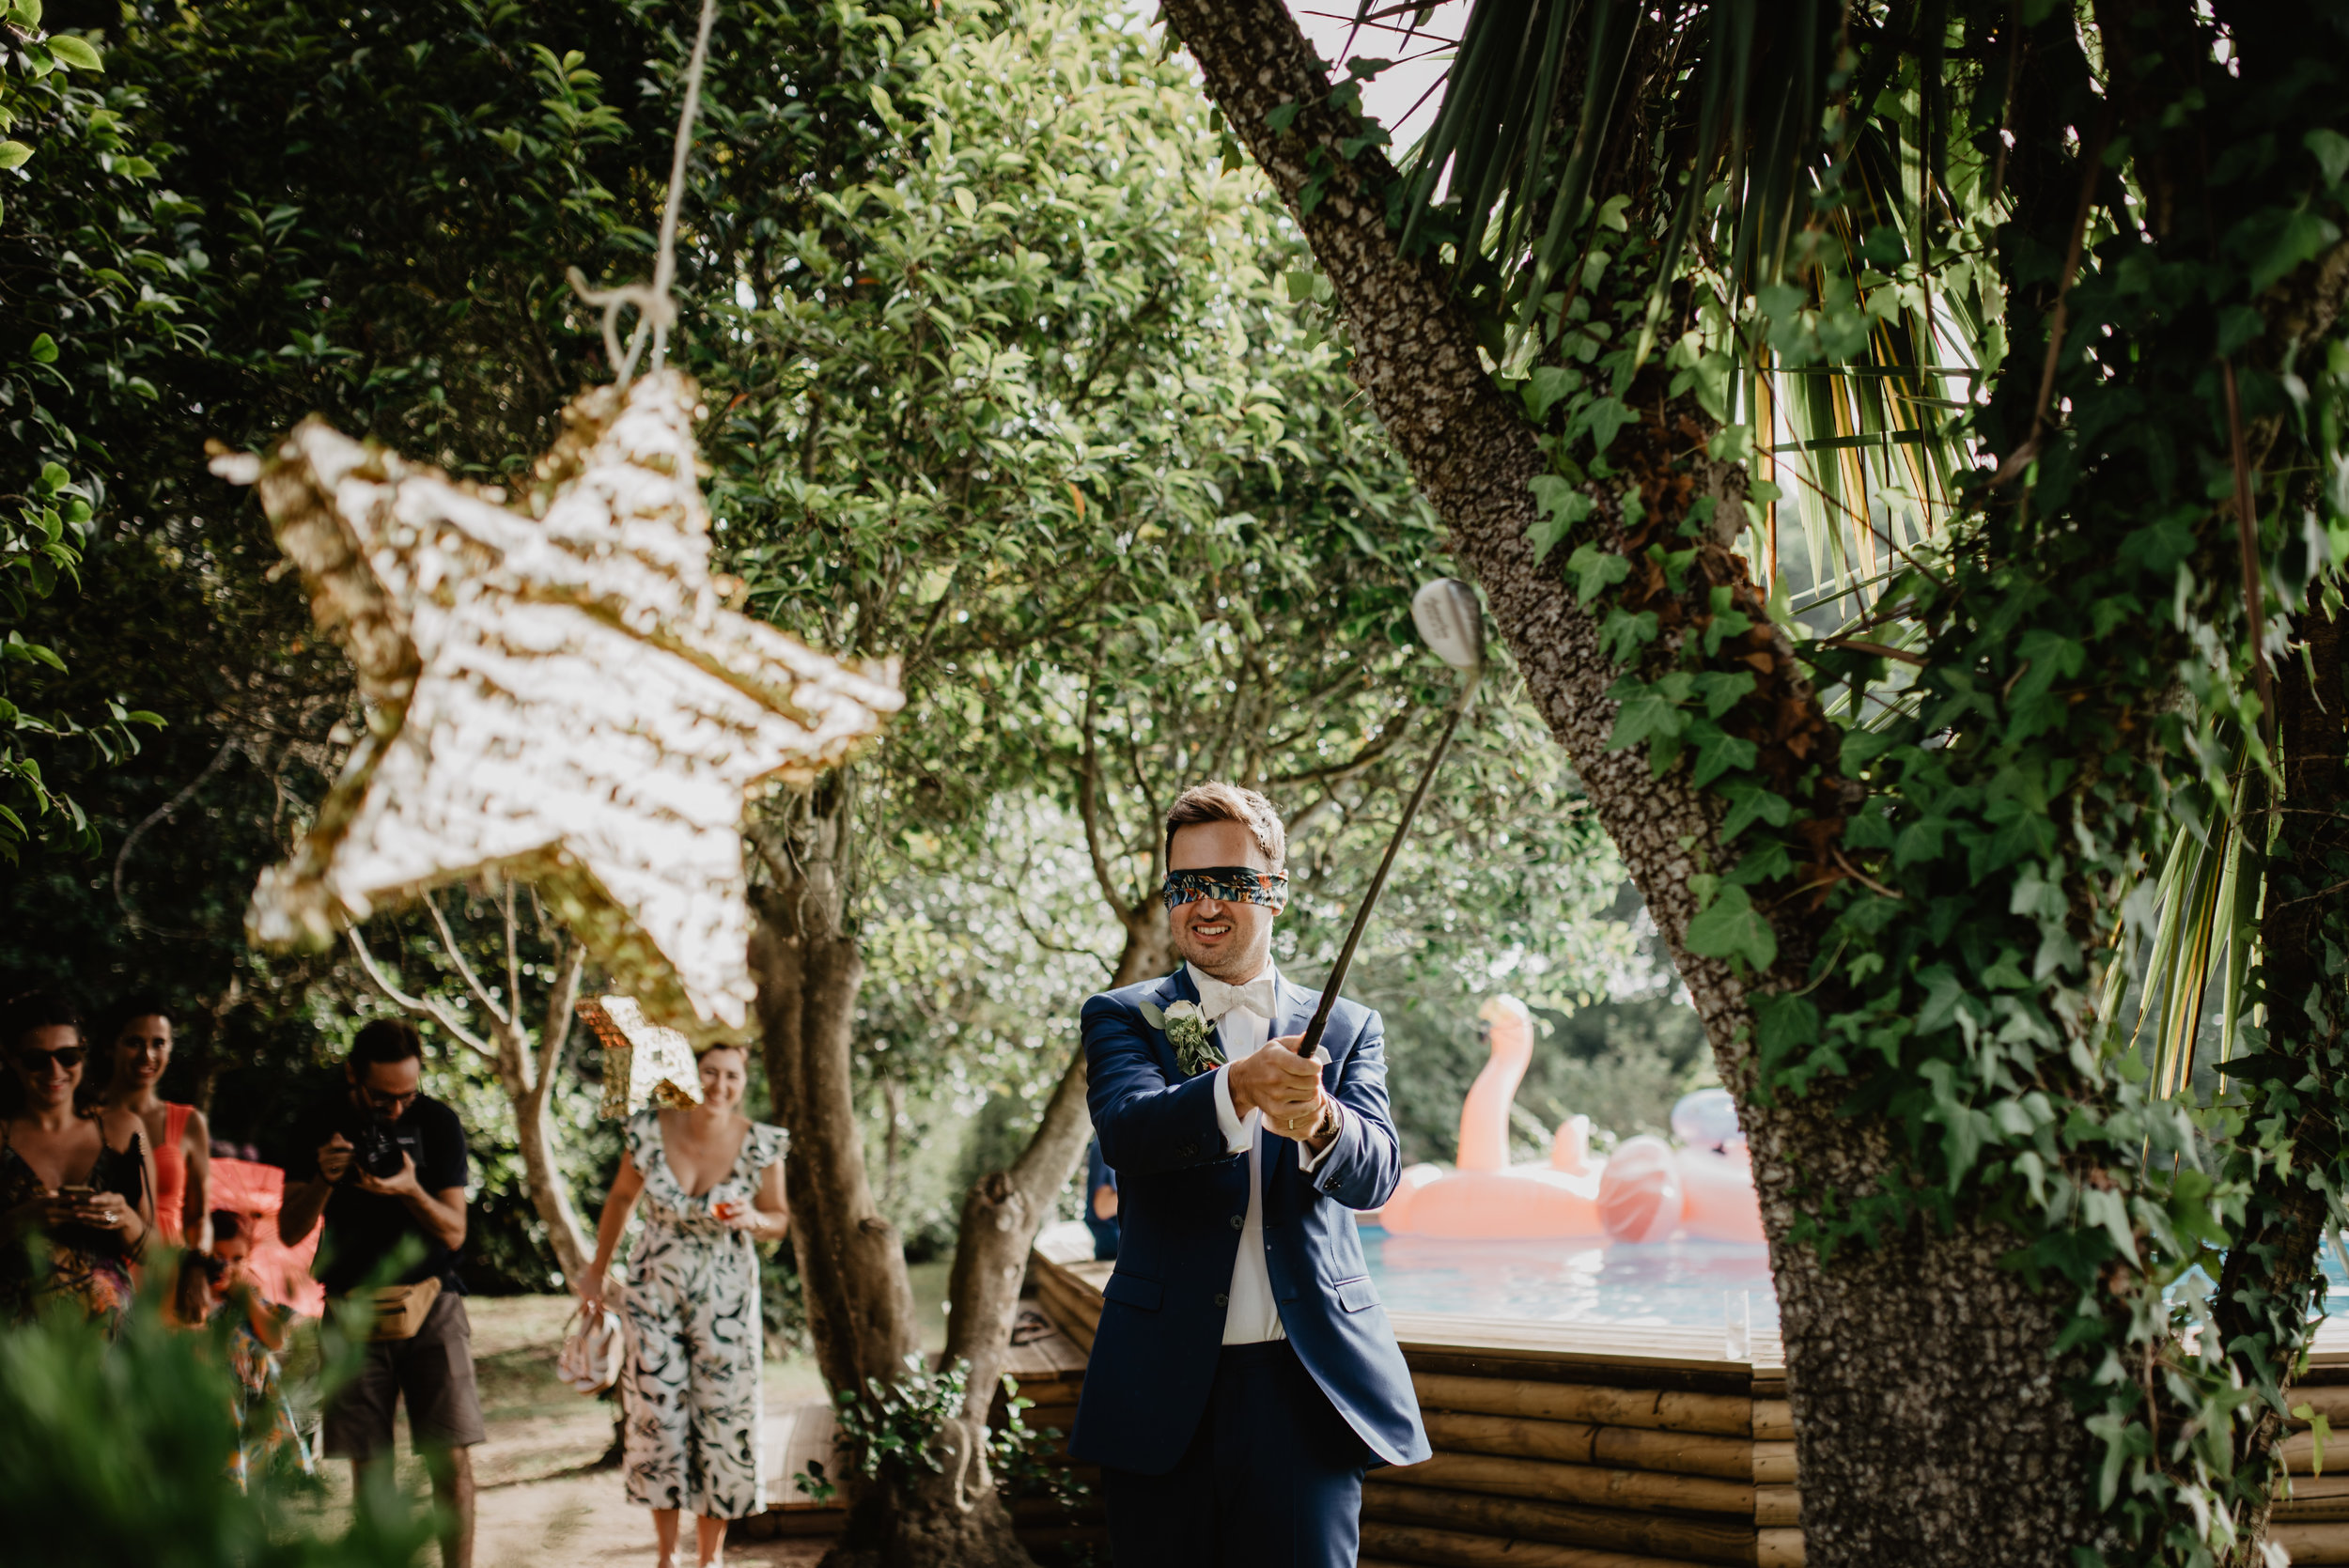 Lapela-photography-wedding-sintra-portugal-83.jpg